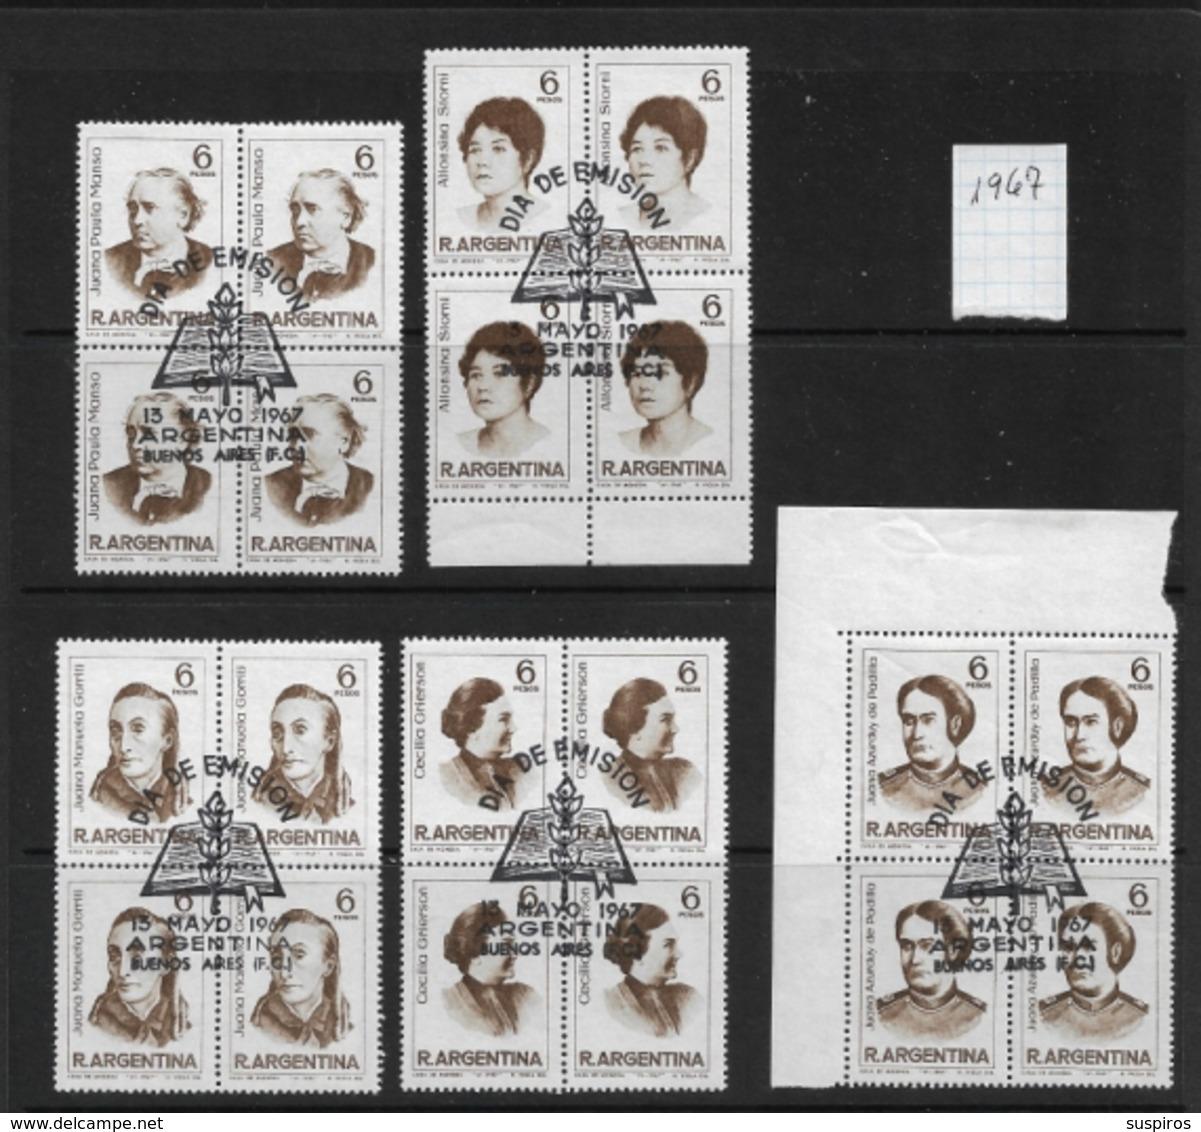 ARGENTINA 1967 Famous Argentine Women   Set 5v  Wm Round Sun  BLOCK OF 4 STAMPS - Unused Stamps